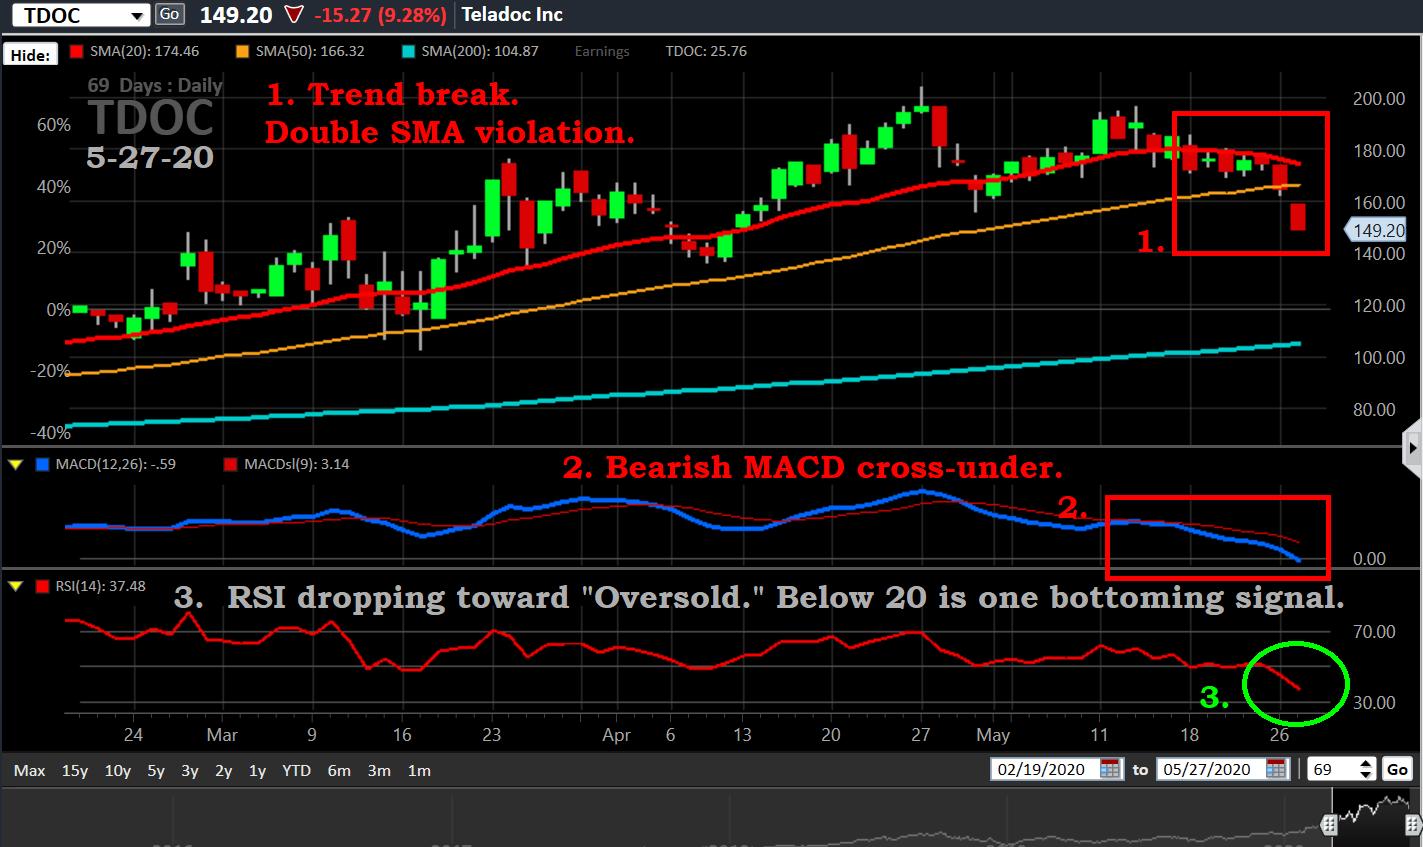 TDOC, 5-27-20, trend break